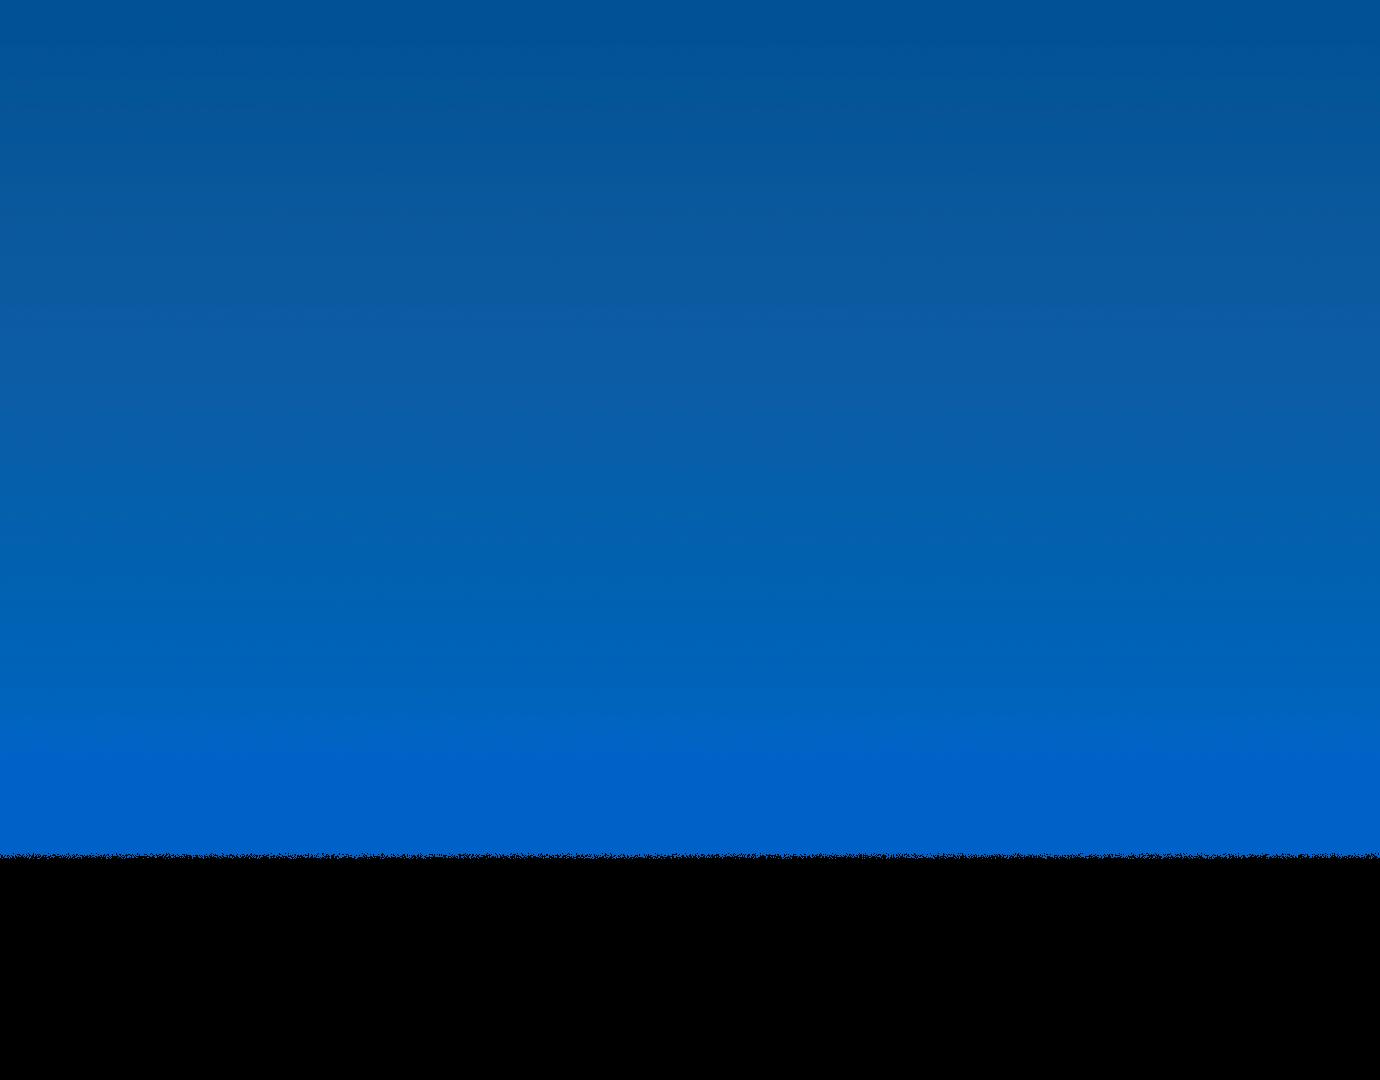 black gradient (copy)